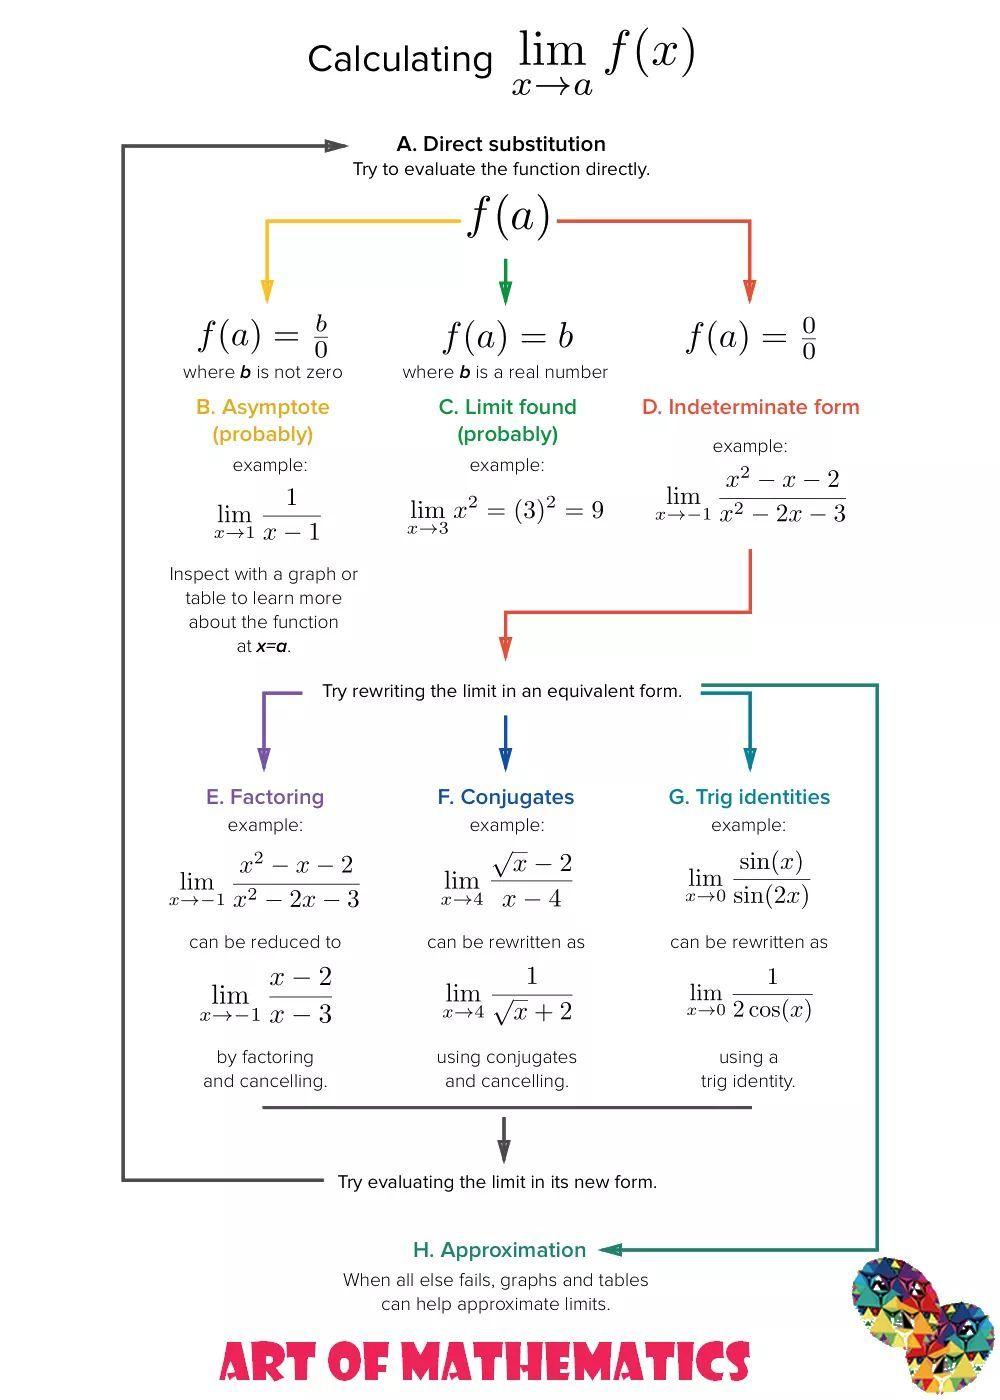 Calculating Limit Simor Ap Calculus Learning Mathematics Mathematics Worksheets